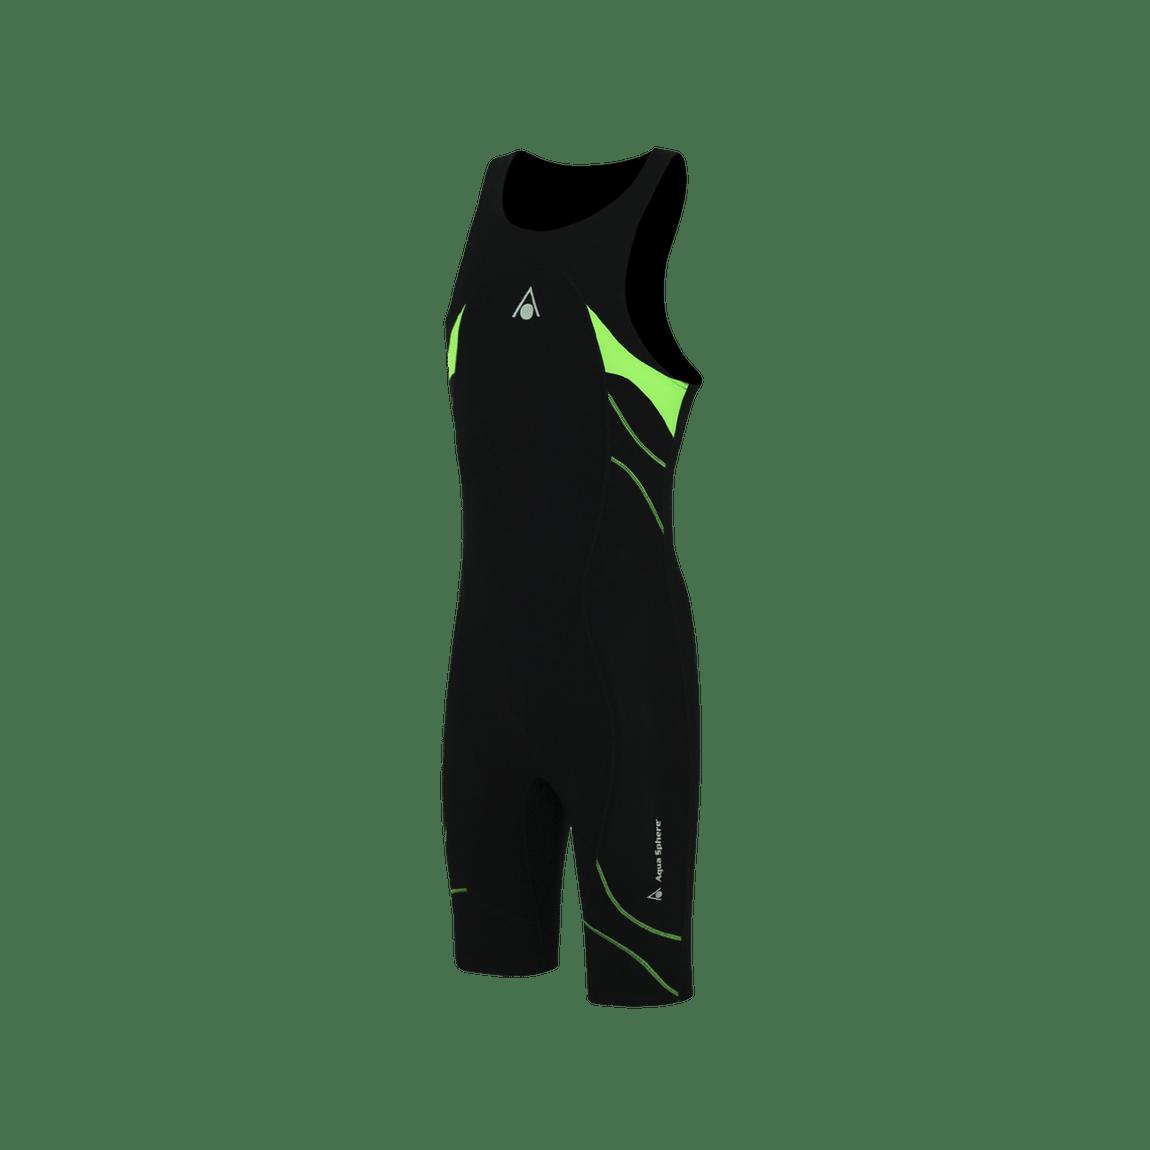 provocar Gratificante Rosa  Tri Suit Aqua Sphere Natación Energize Speedsuit - martimx  Martí - Tienda  en Línea